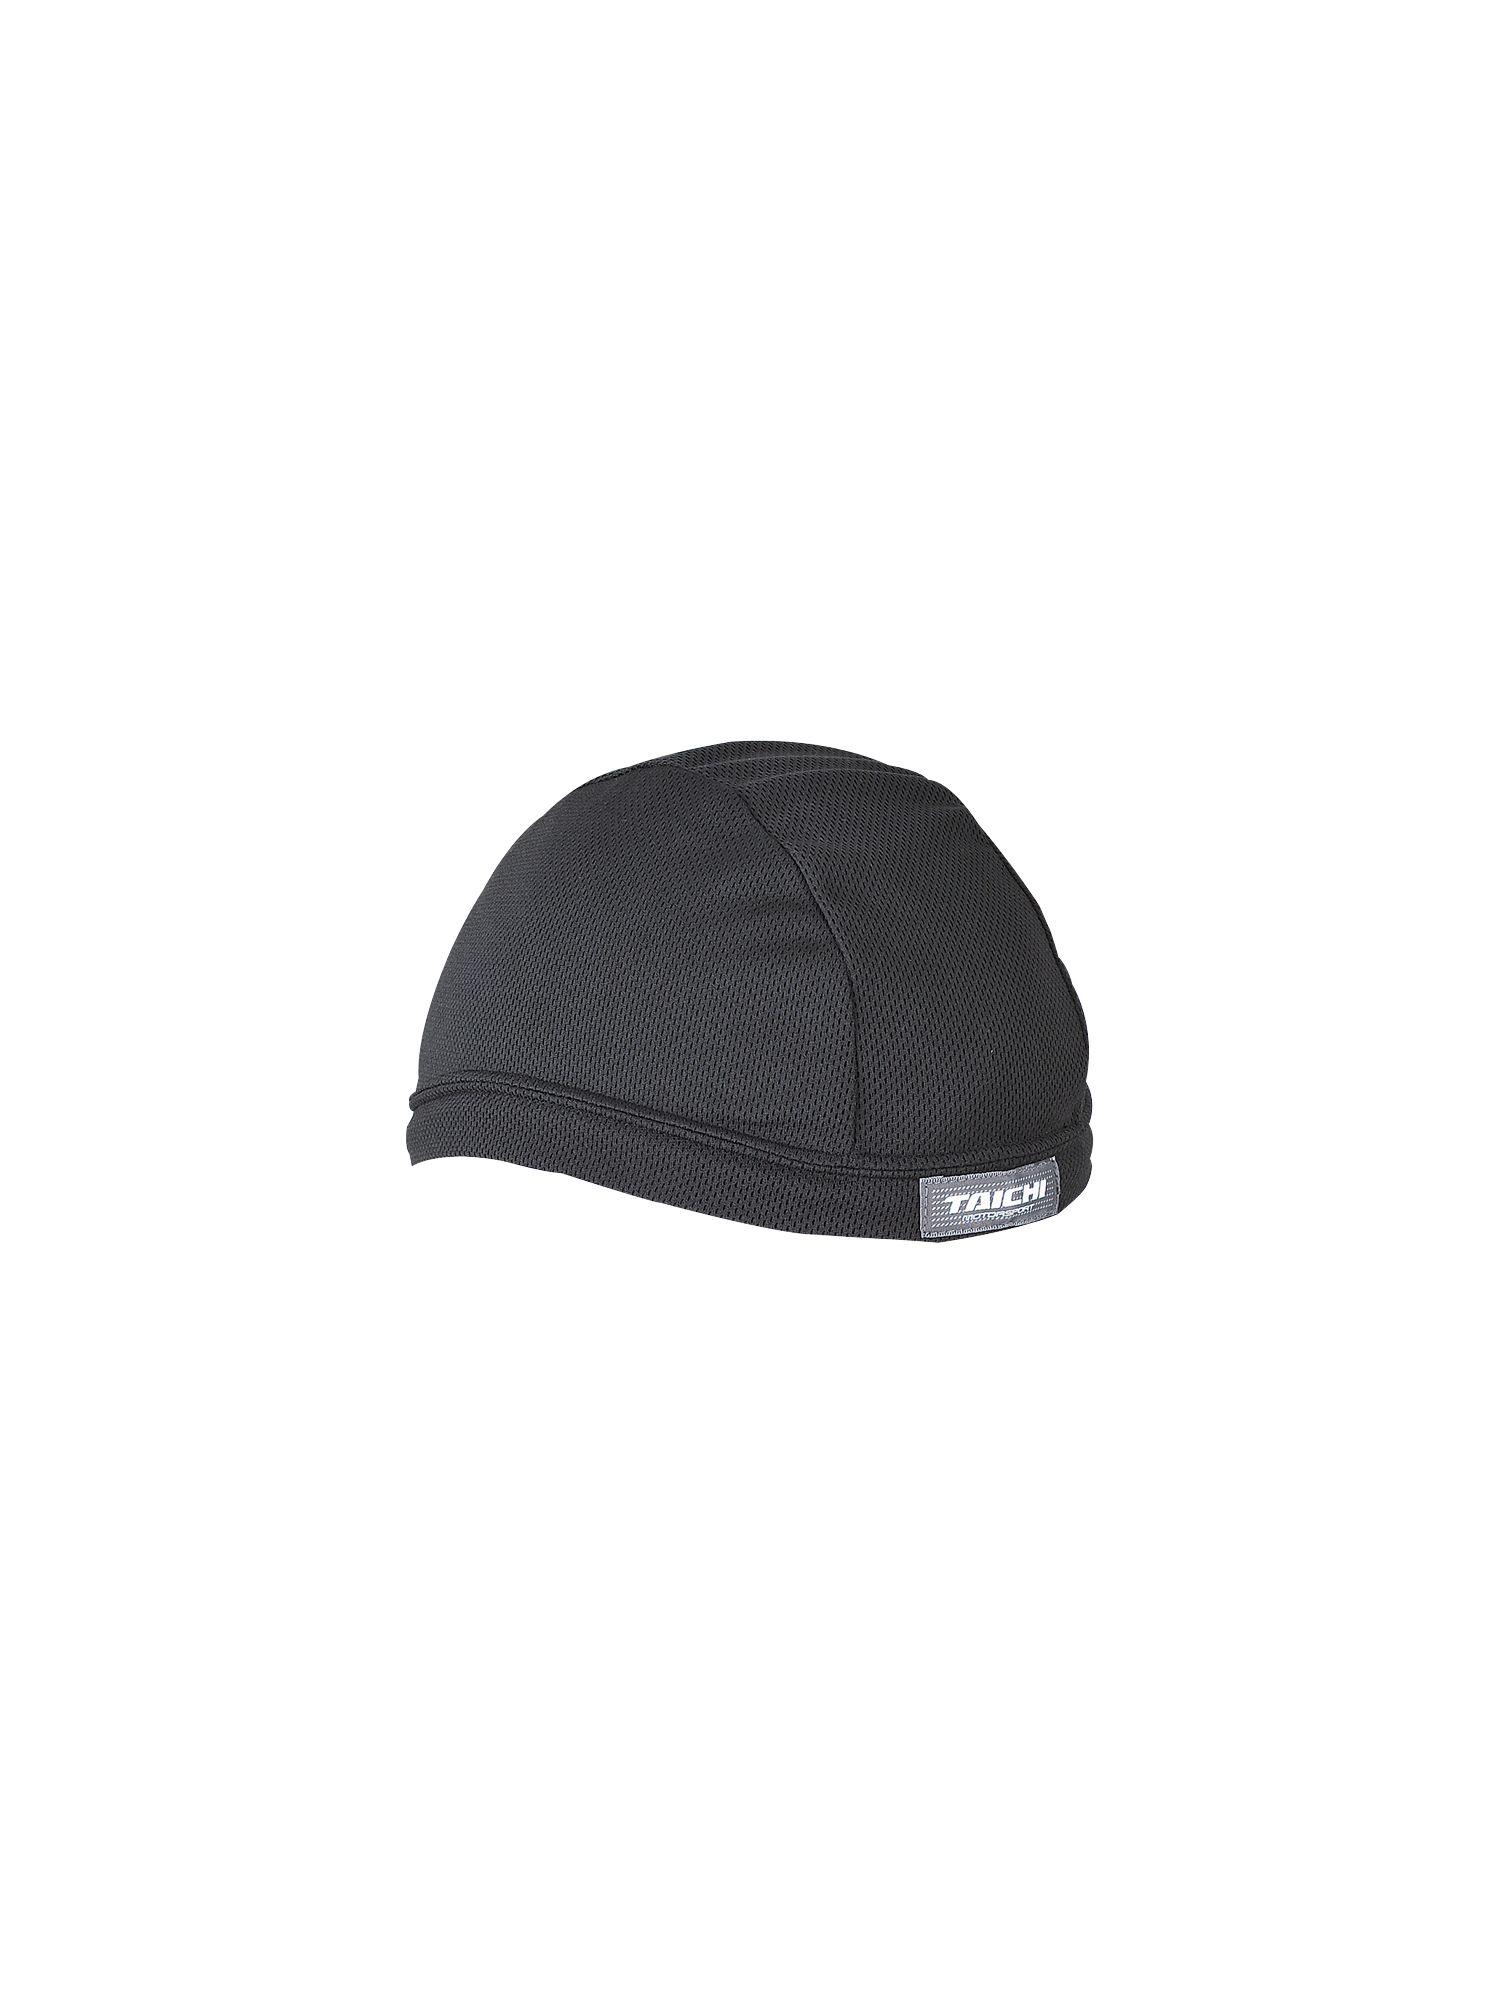 RSC115|COOL RIDE HELMET INNER CAP[1color]